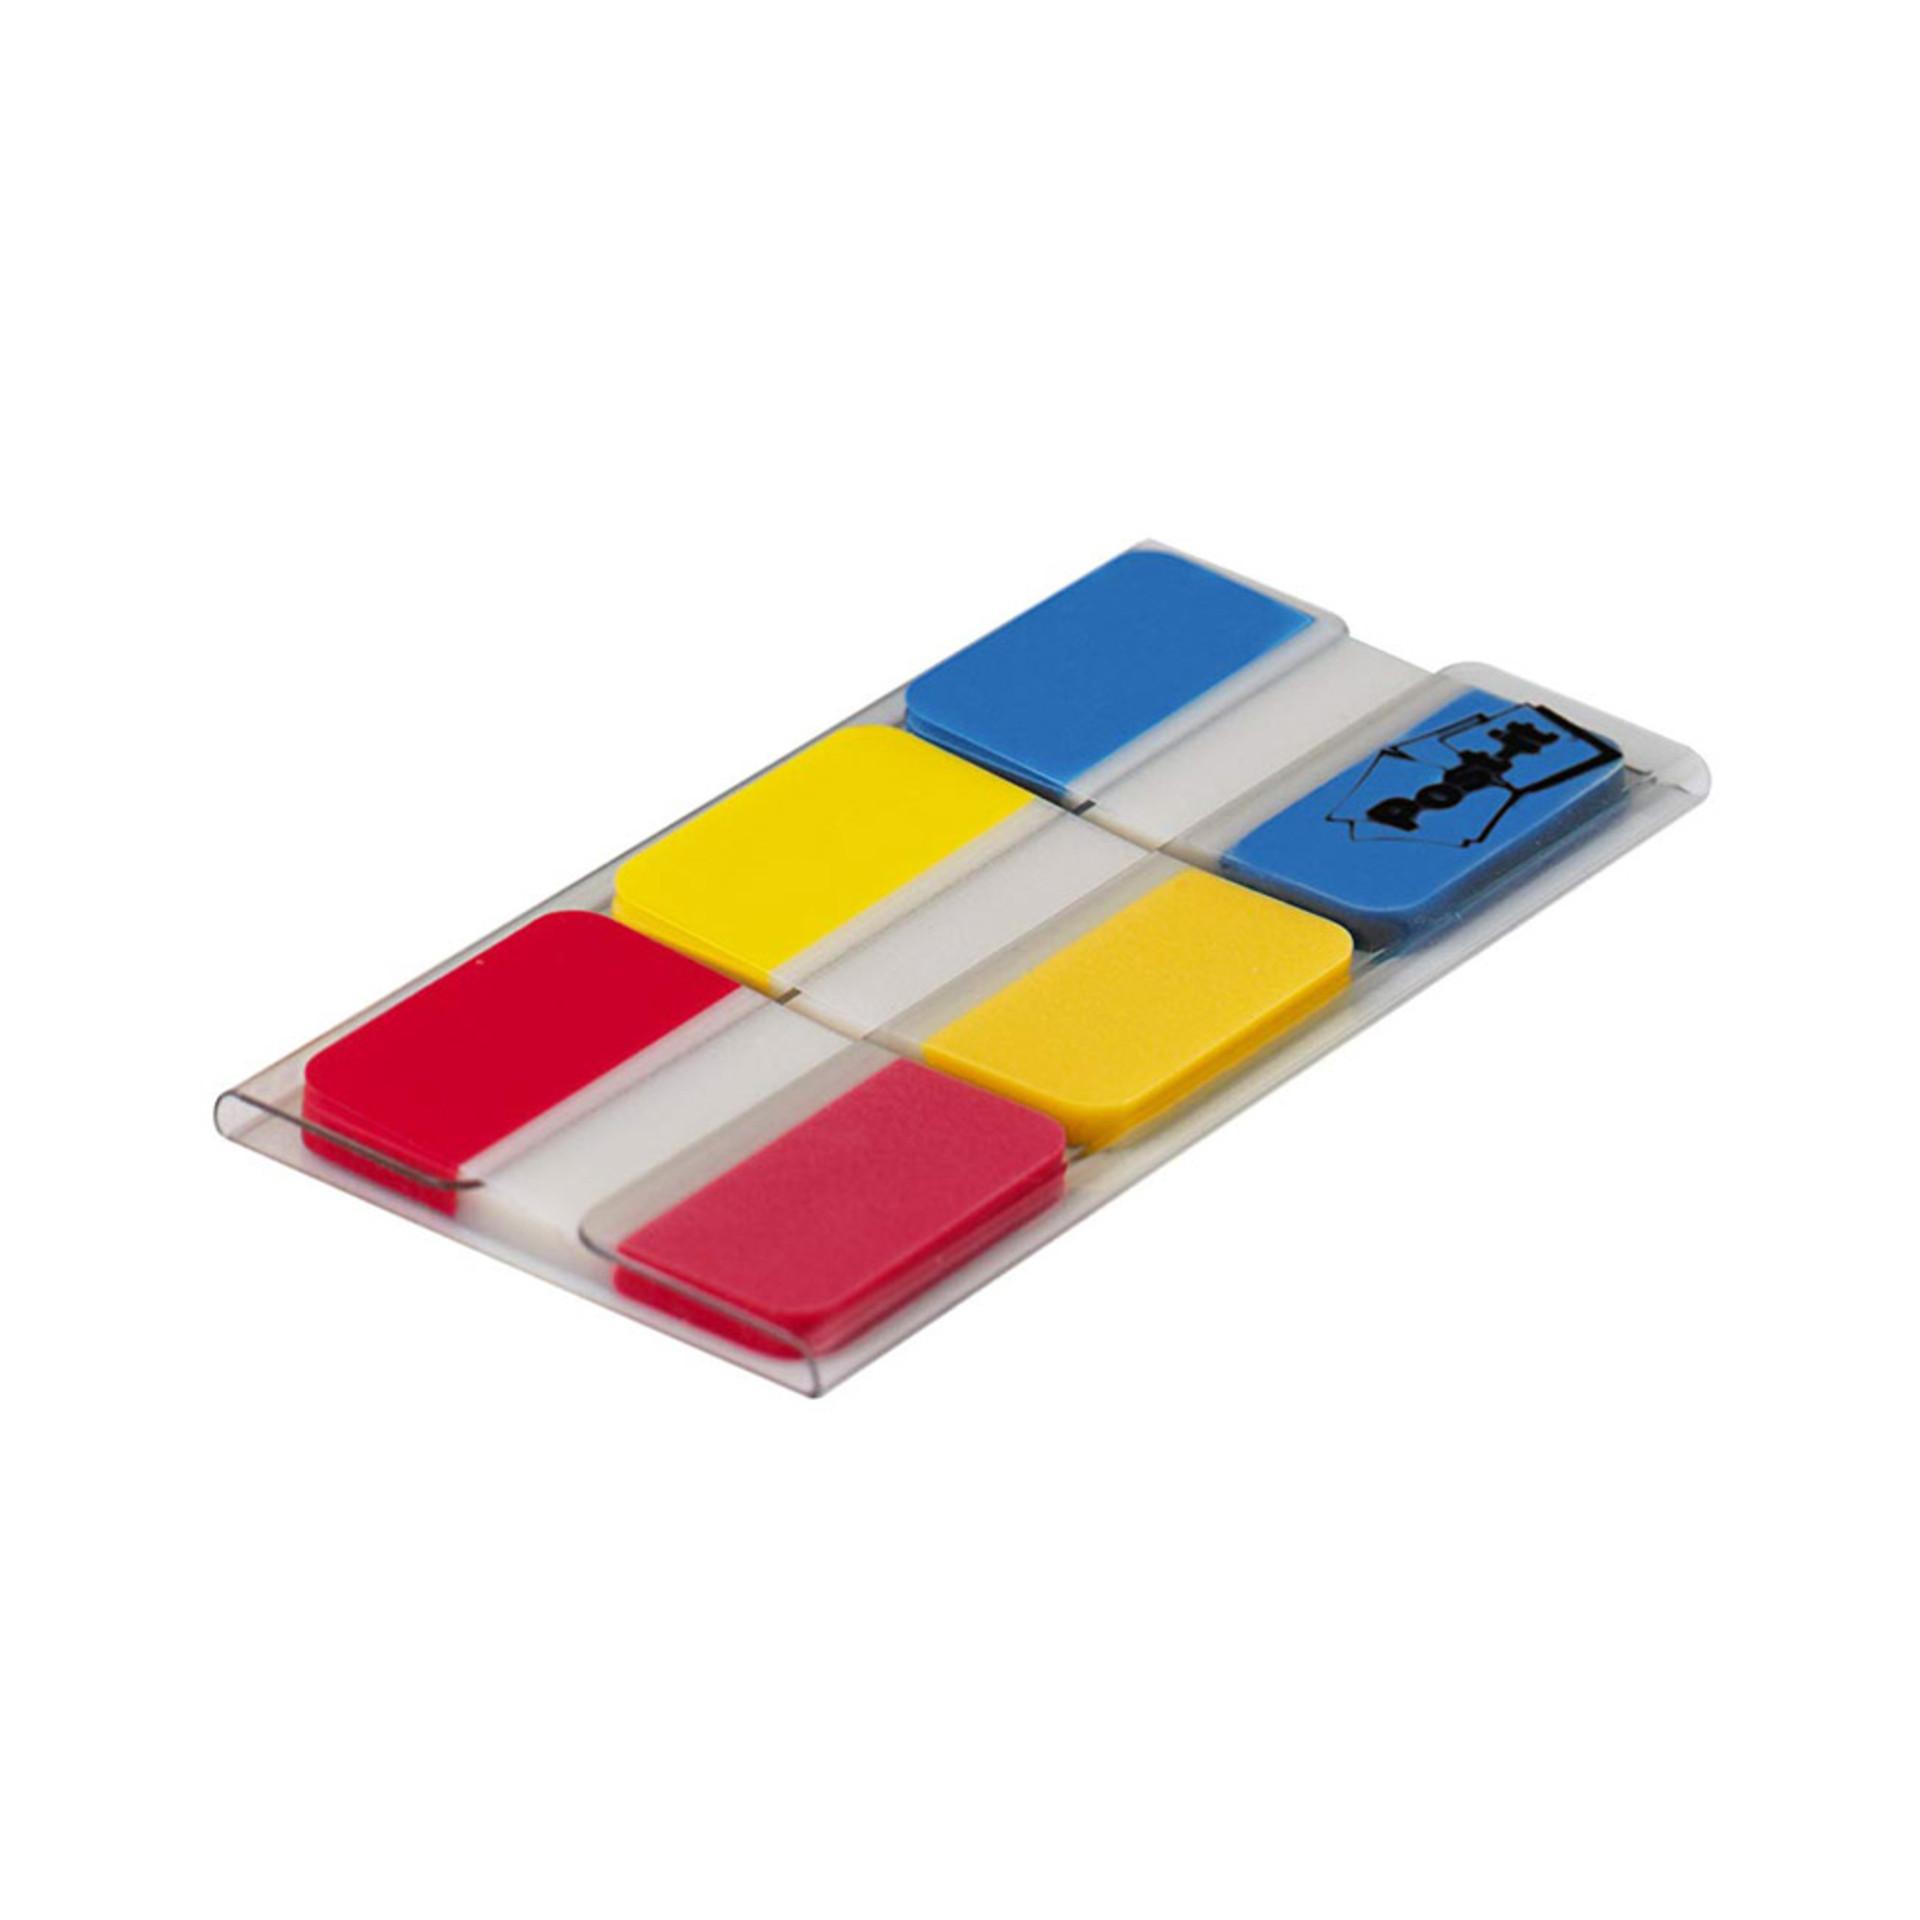 Post-it Three Colors Tabs